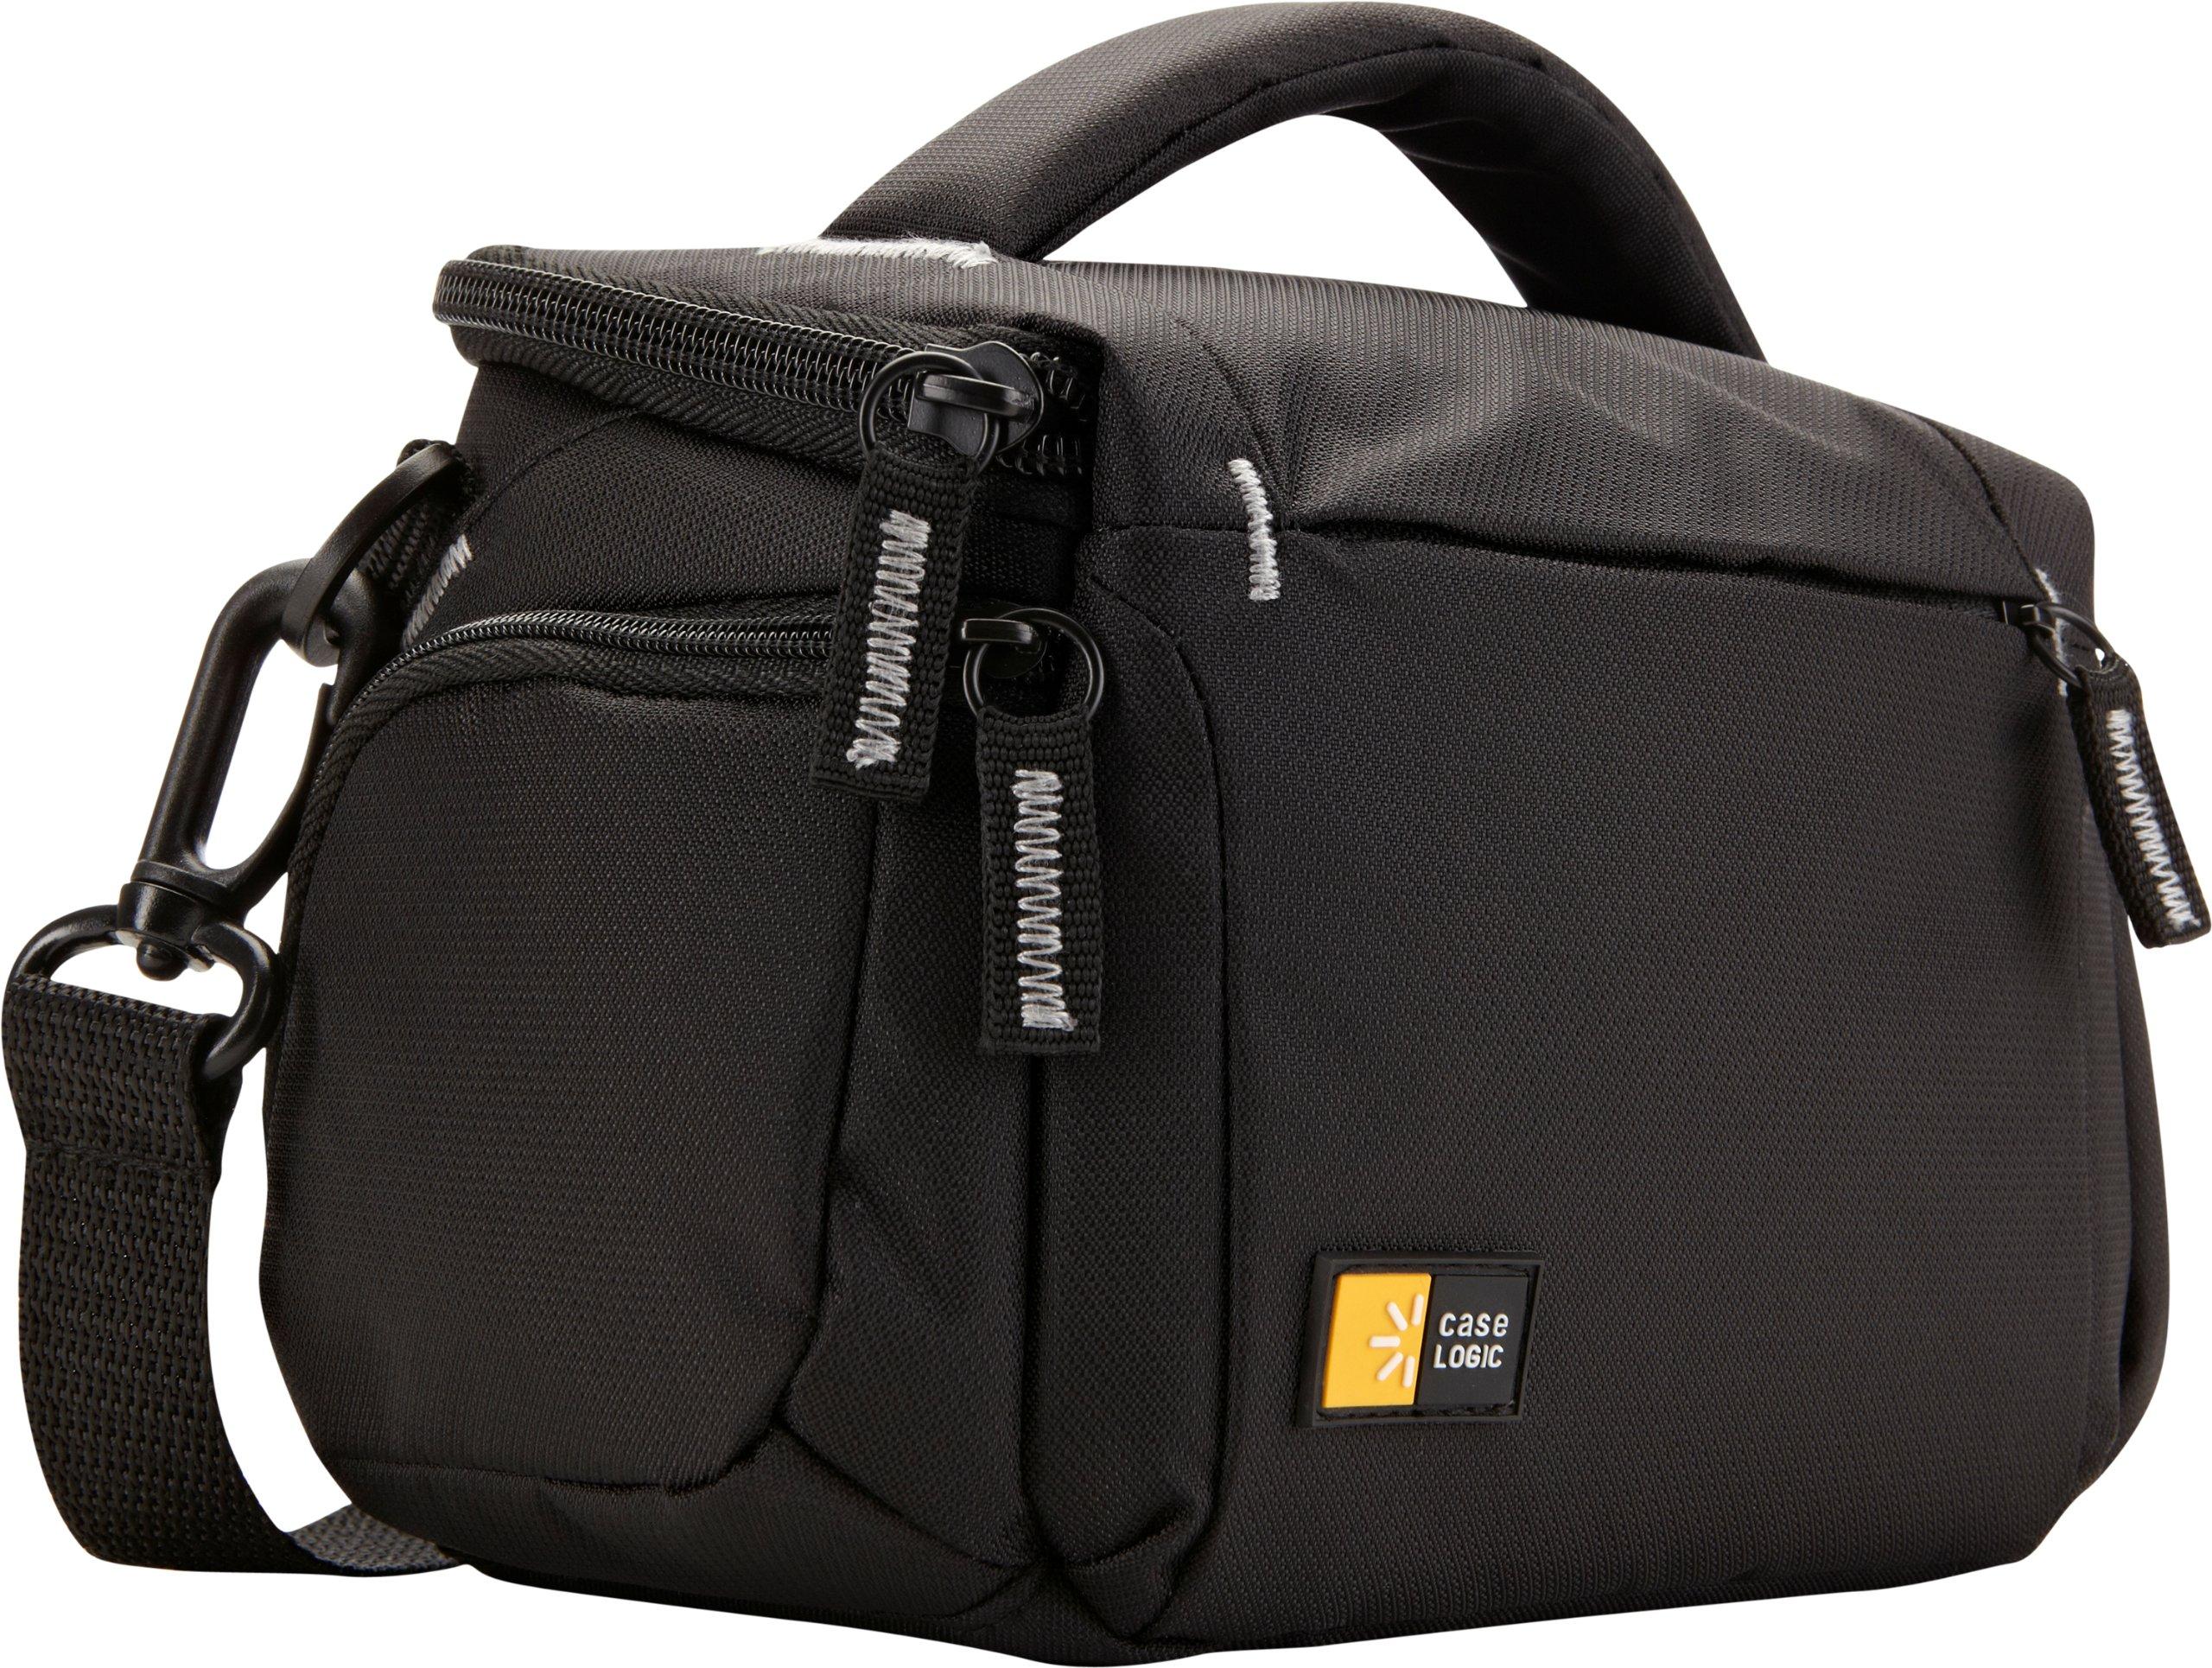 Case Logic TBC-405 Compact System/Hybrid/Camcorder Kit Bag (Black) by Case Logic